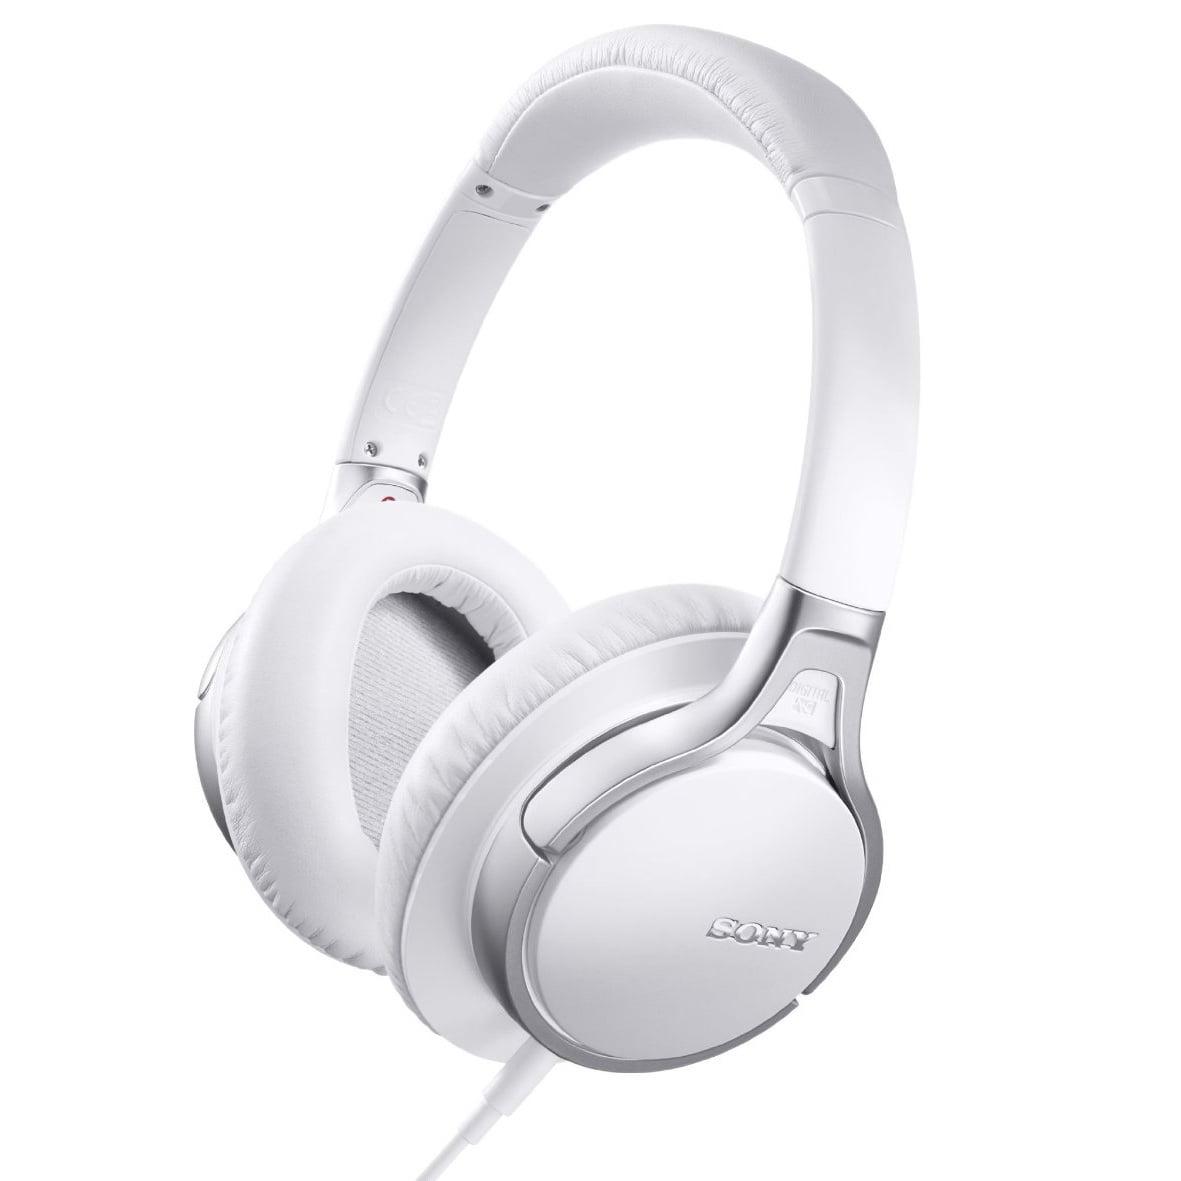 Sony iPad/iPhone/iPod Noise-Canceling Wired Headphones (W...